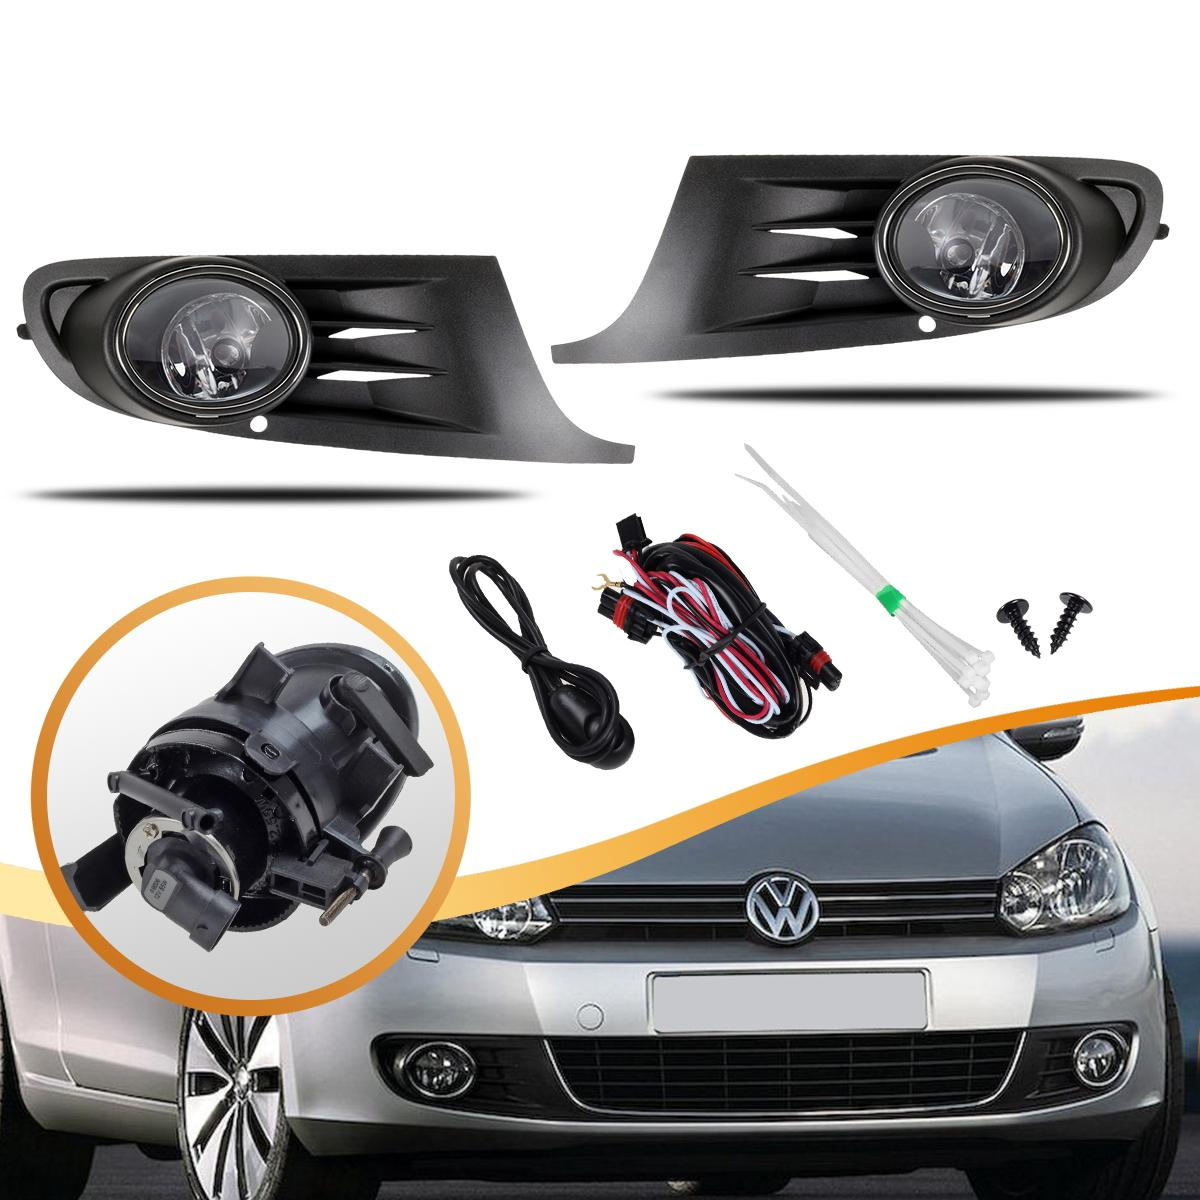 2015 Volkswagen Golf Sportwagen Suspension: Front Bumper Fog Lights Lamp Grille For 2010-2012 VW Jetta